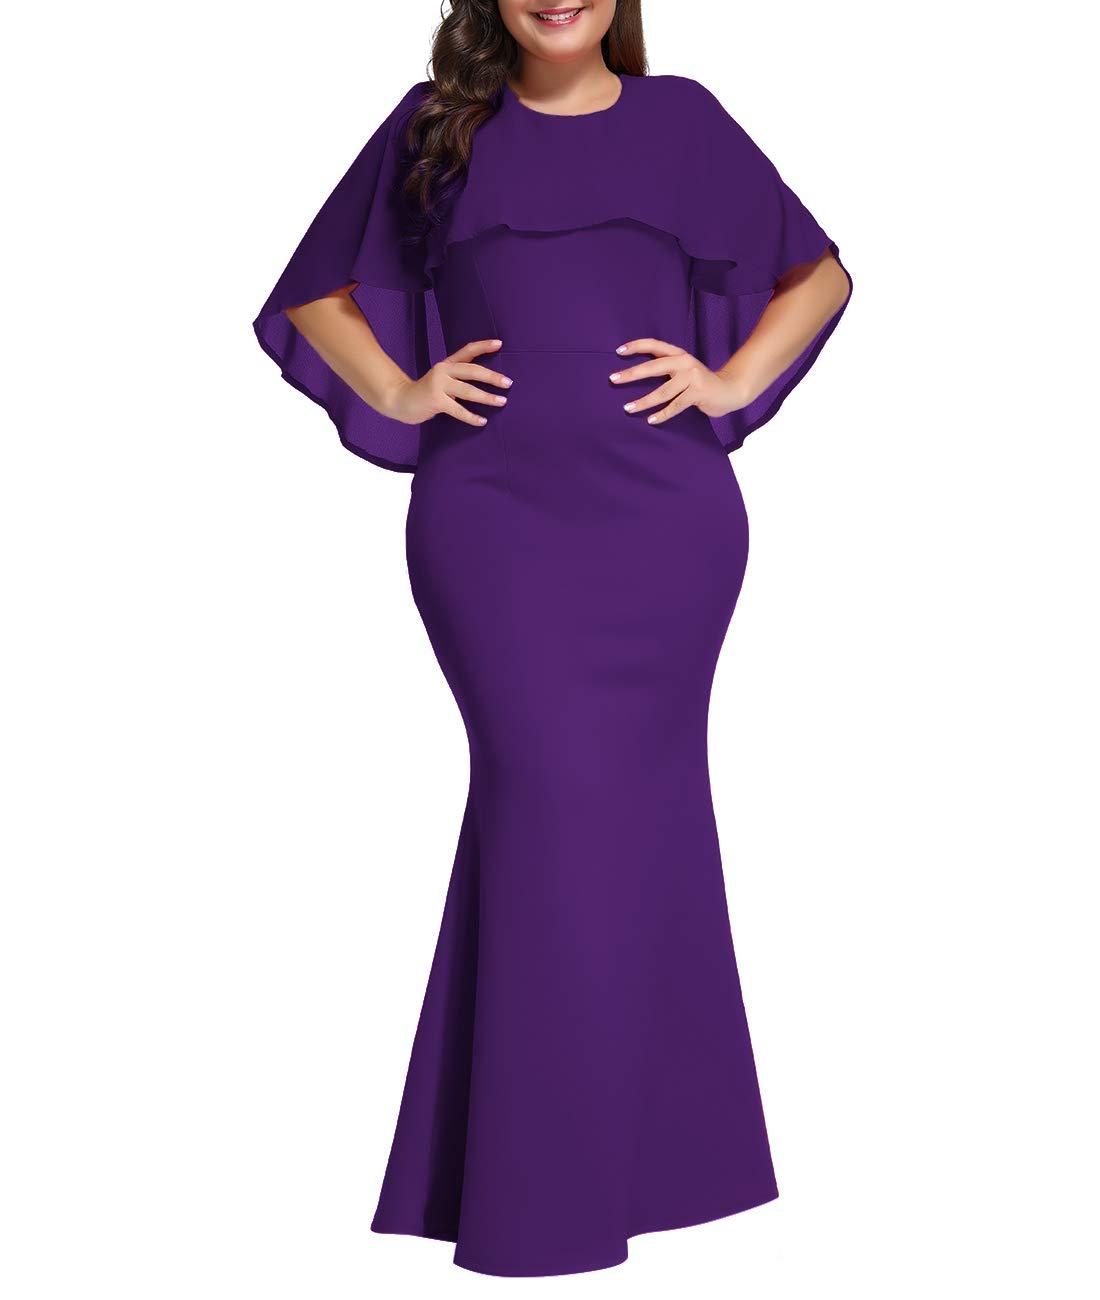 Lalagen Womens Ruffle Mermaid Formal Gown Plus Size Evening Party Maxi Dress Purple XXL-1